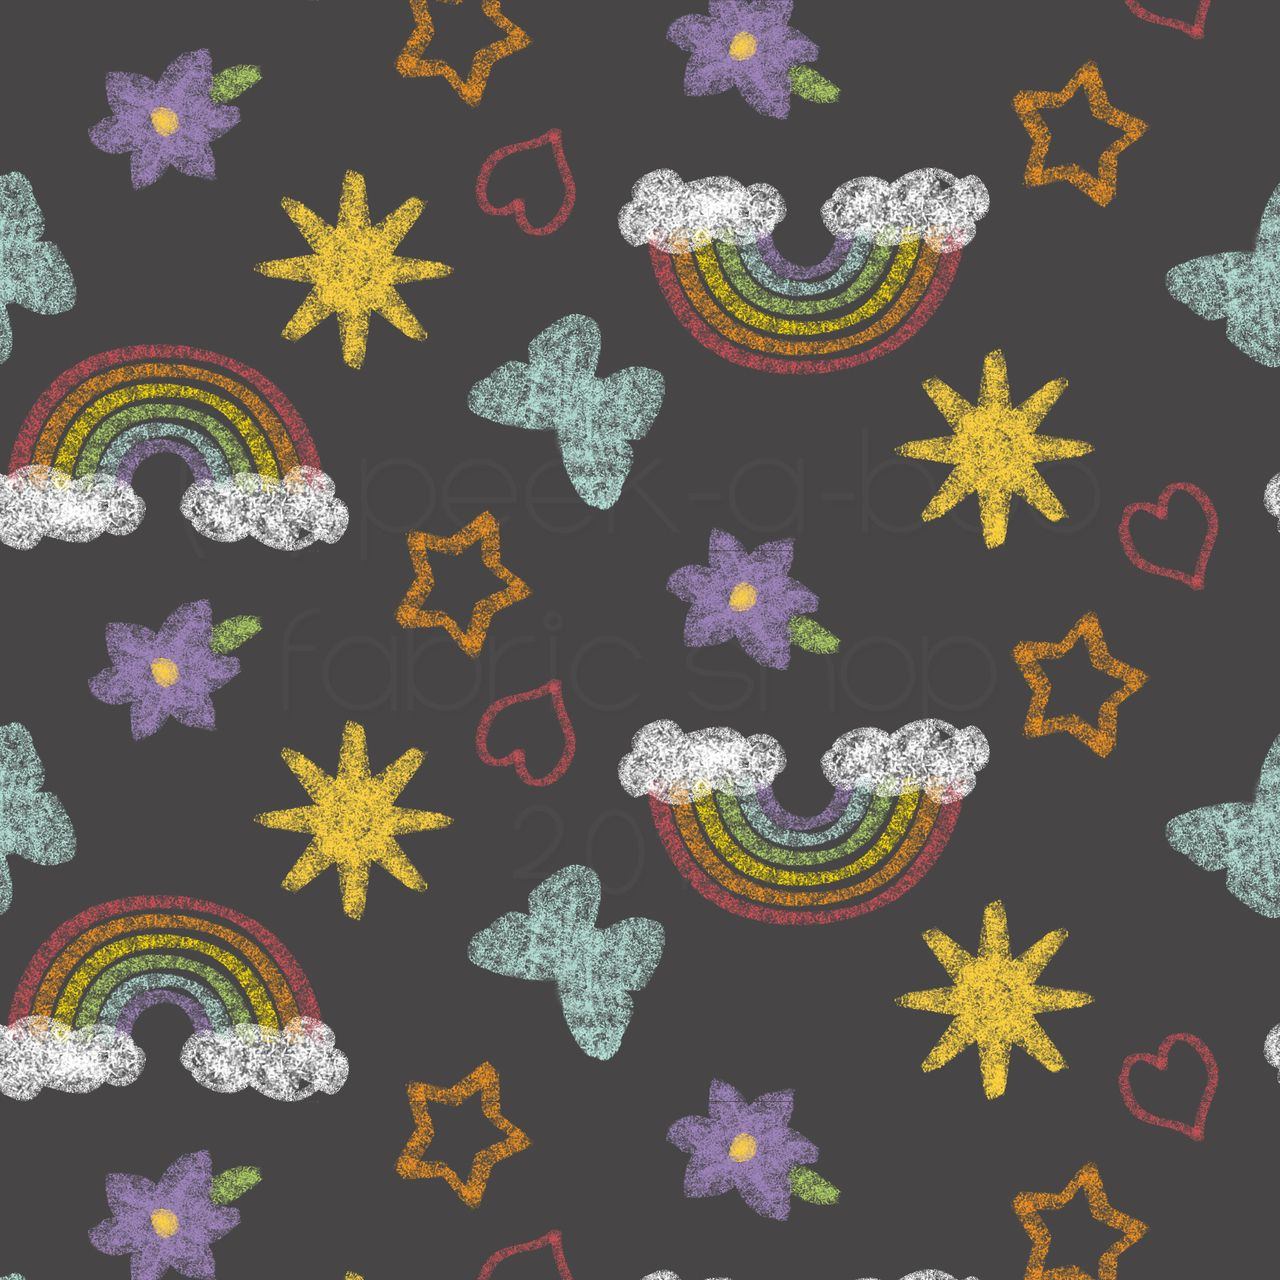 004734a6d07 PAB Chalk Doodles Cotton Lycra - Peek-a-Boo Pattern Shop   Fabric ...